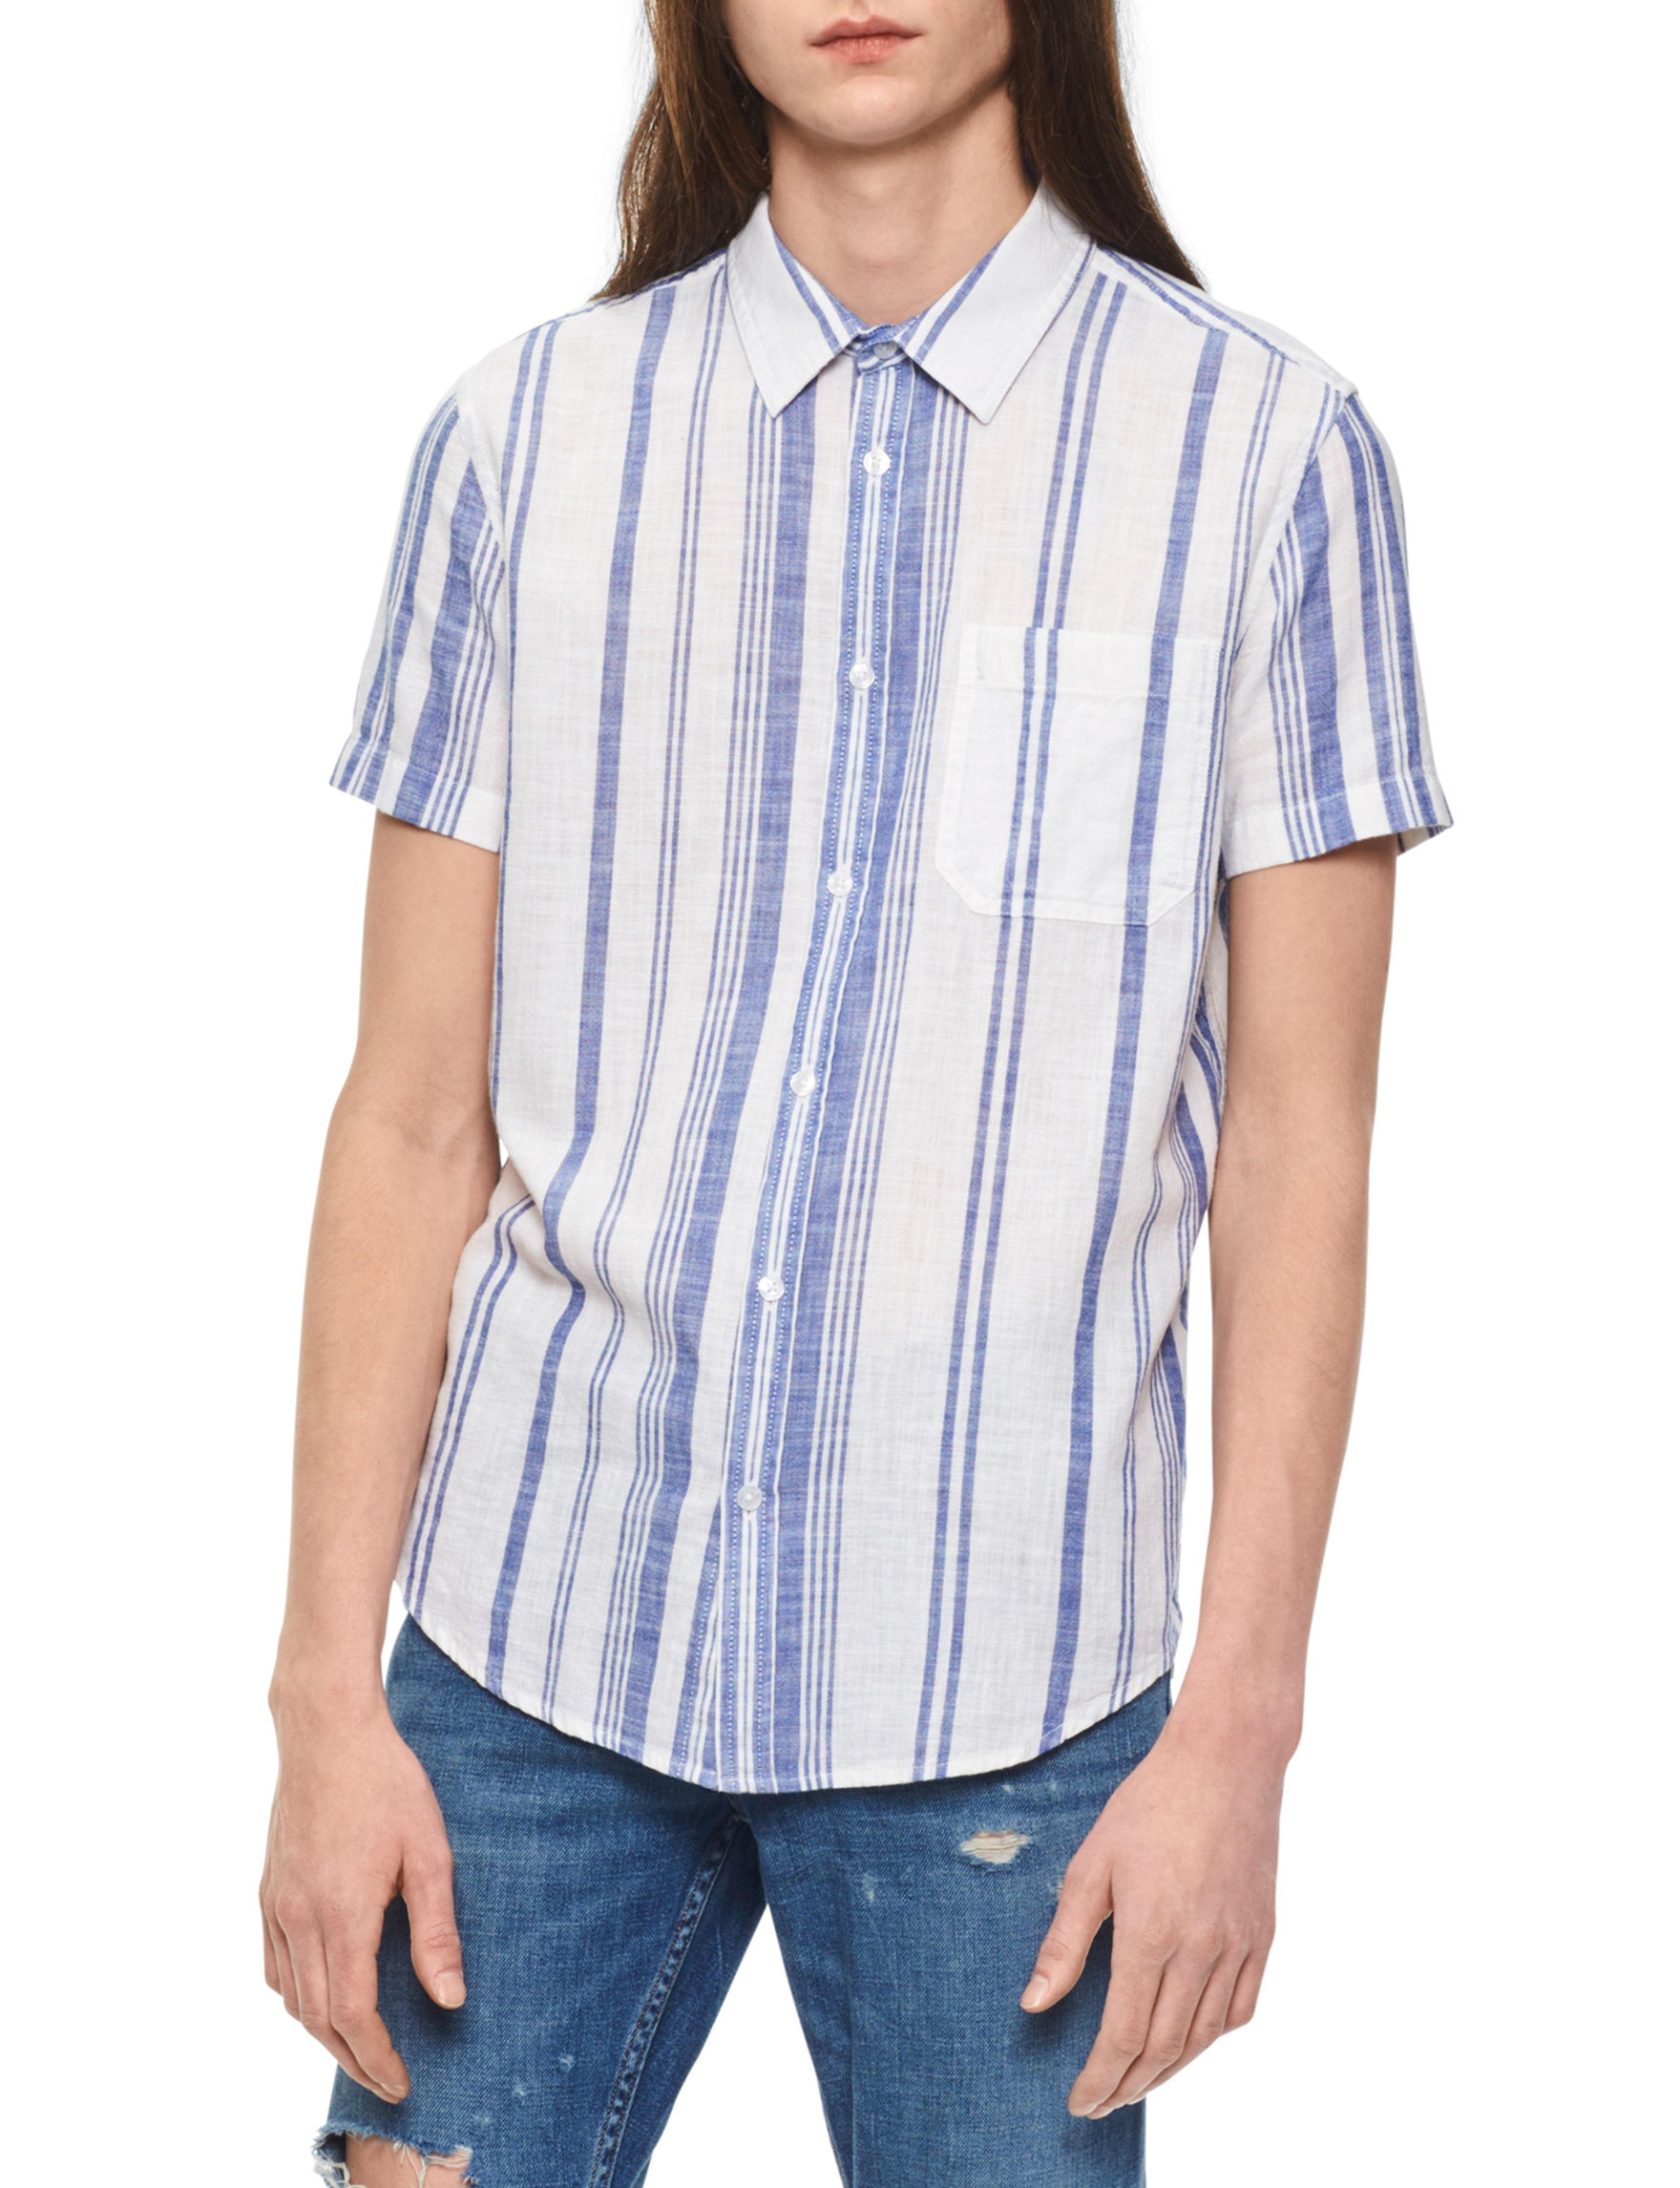 Calvin Klein White Stripe Casual Button Down Shirts